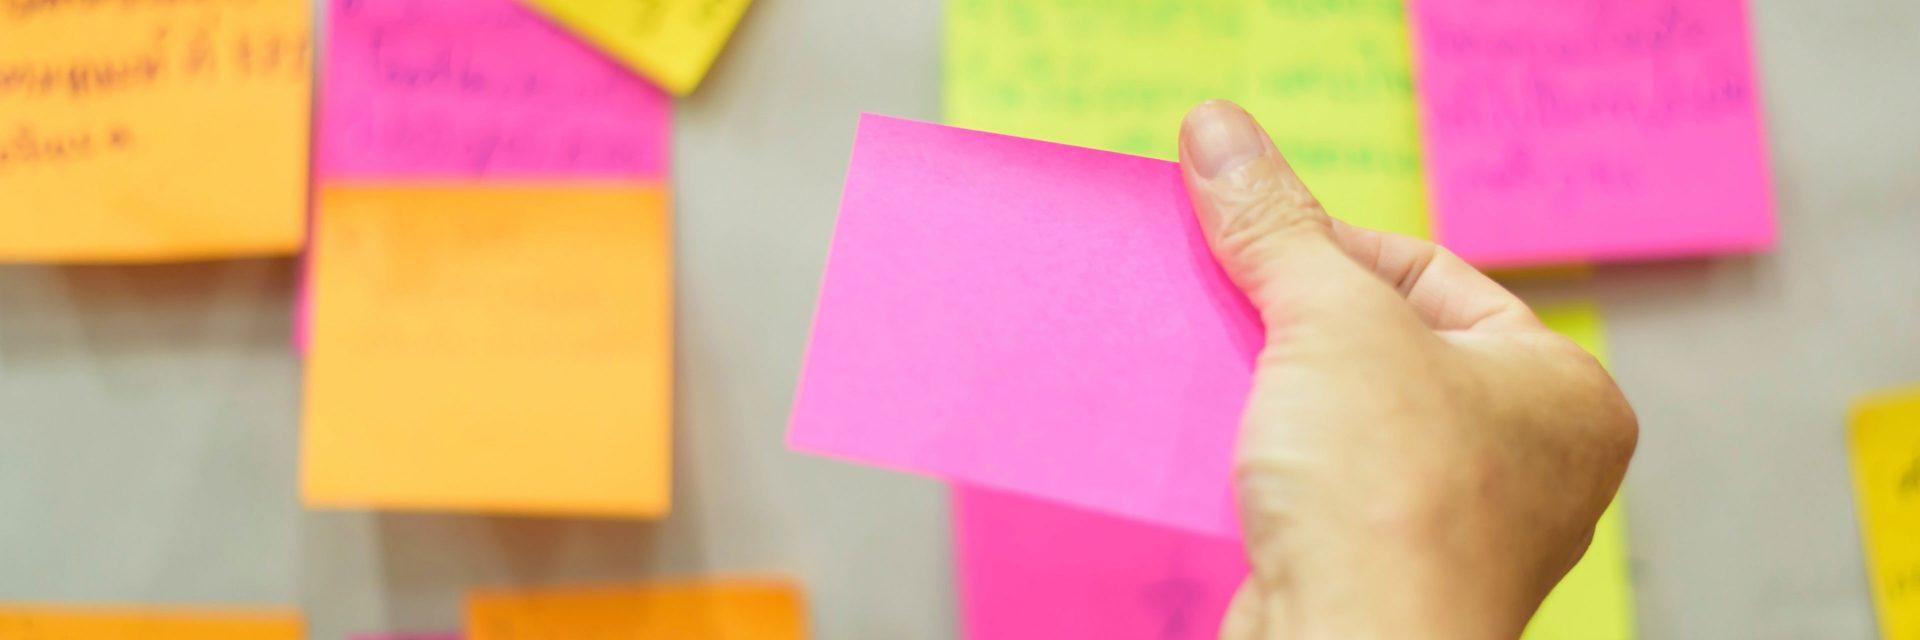 Using Target Value Design: A short introduction